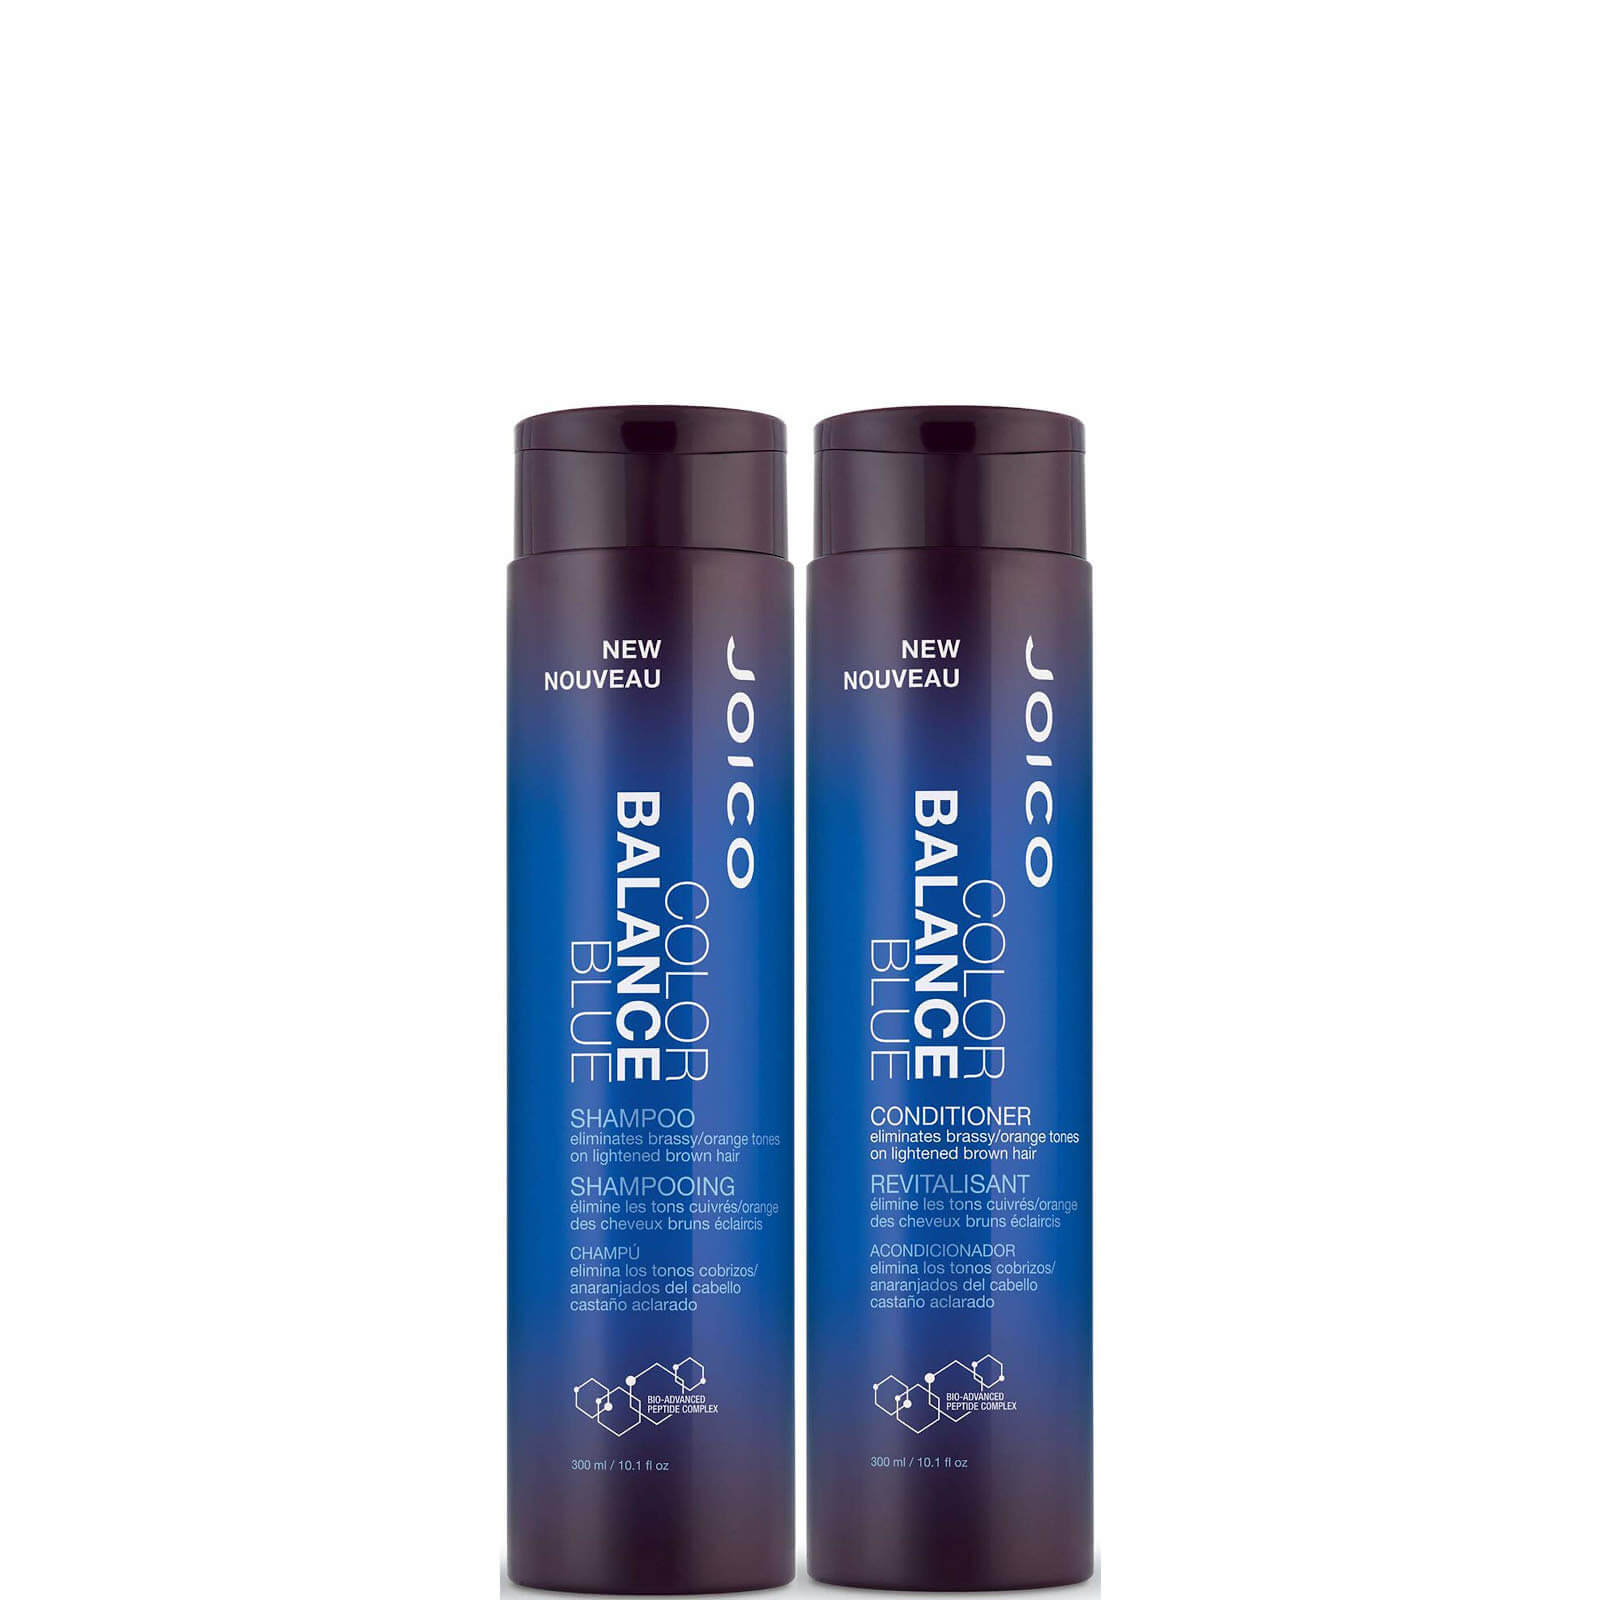 Купить Joico Color Balance Blue Shampoo and Conditioner (2 x 300ml)